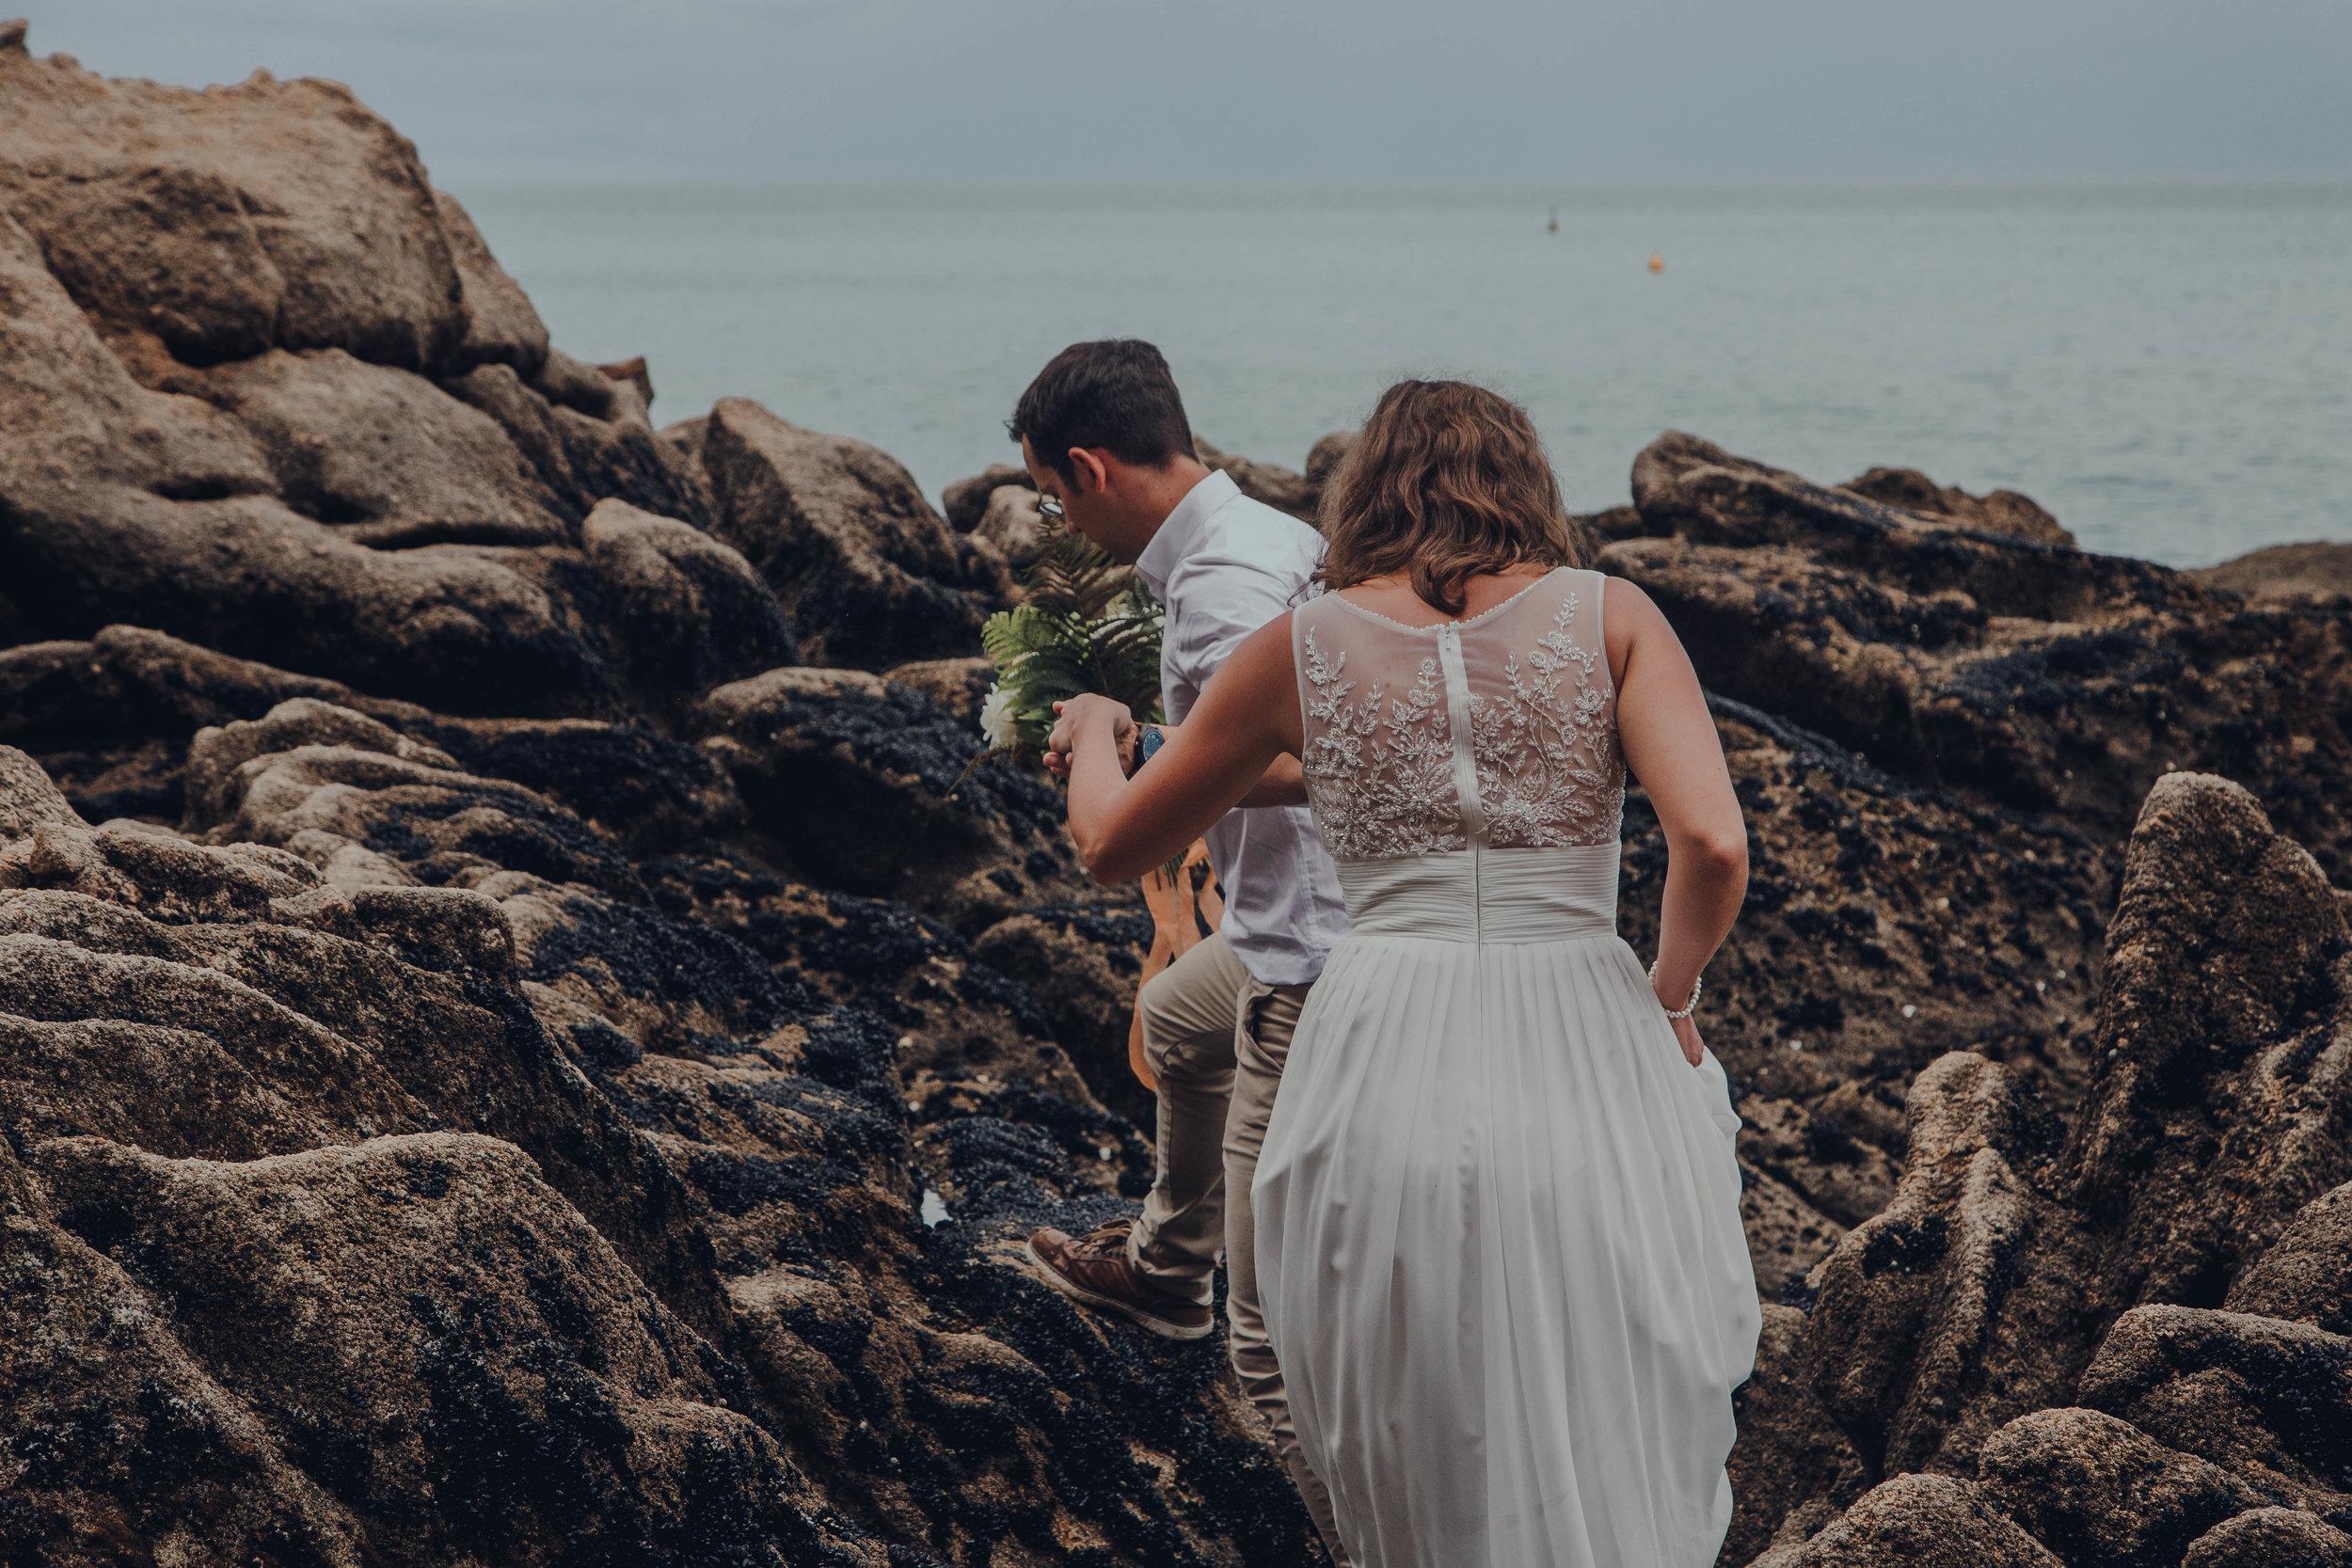 David+&+Jasmin+Wedding-3343.jpg